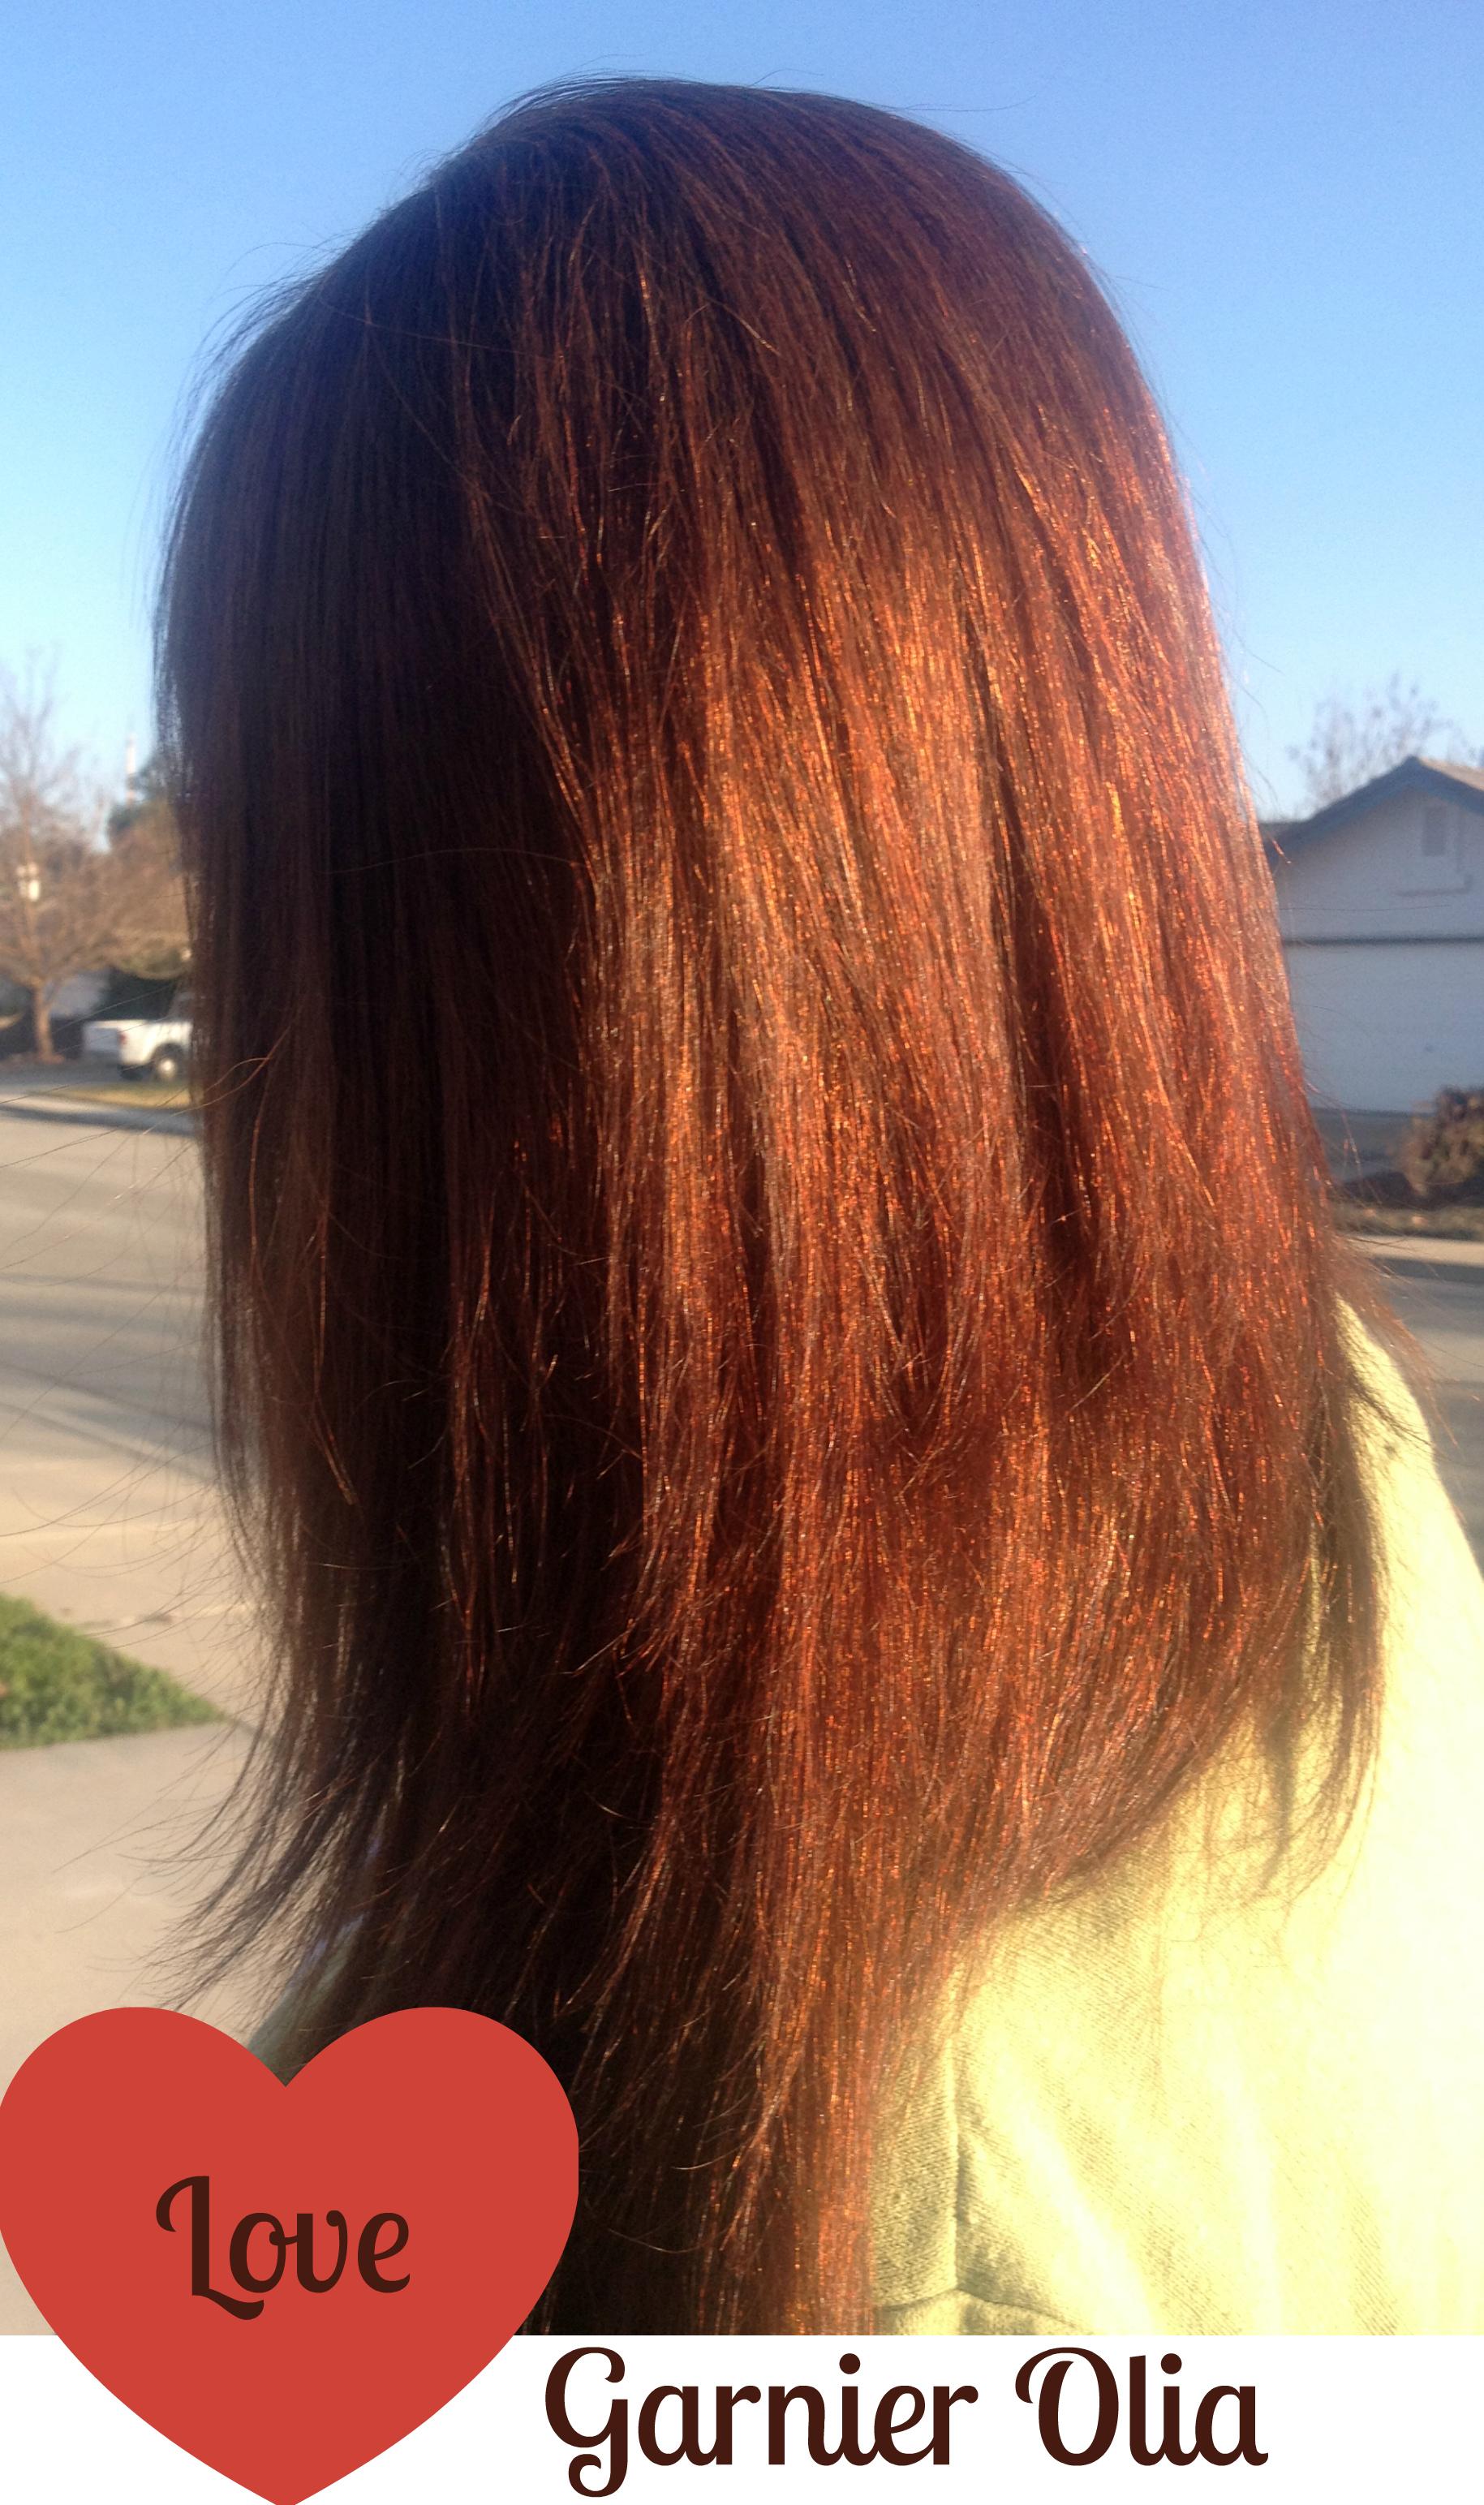 Colored Hair Garnier Olia Review